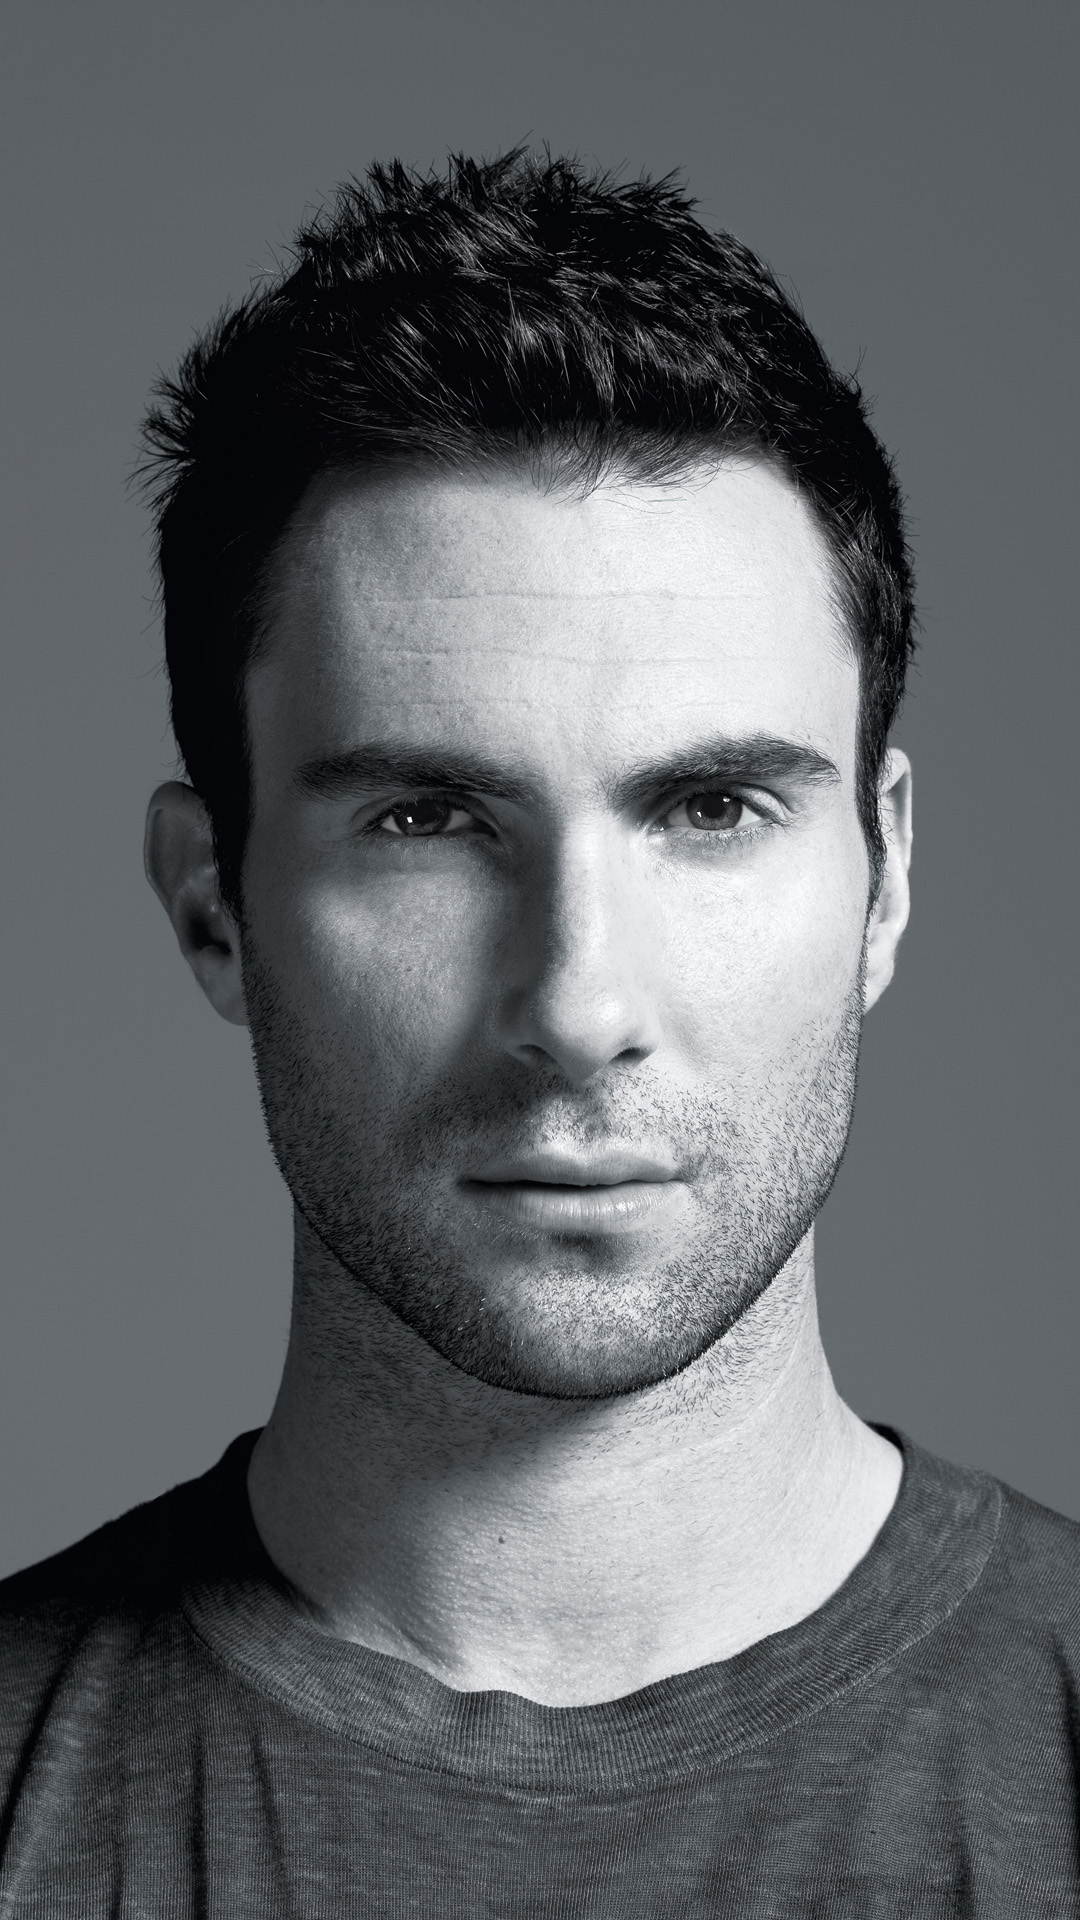 Adam Levine Maroon 5 Best Htc One Wallpapers